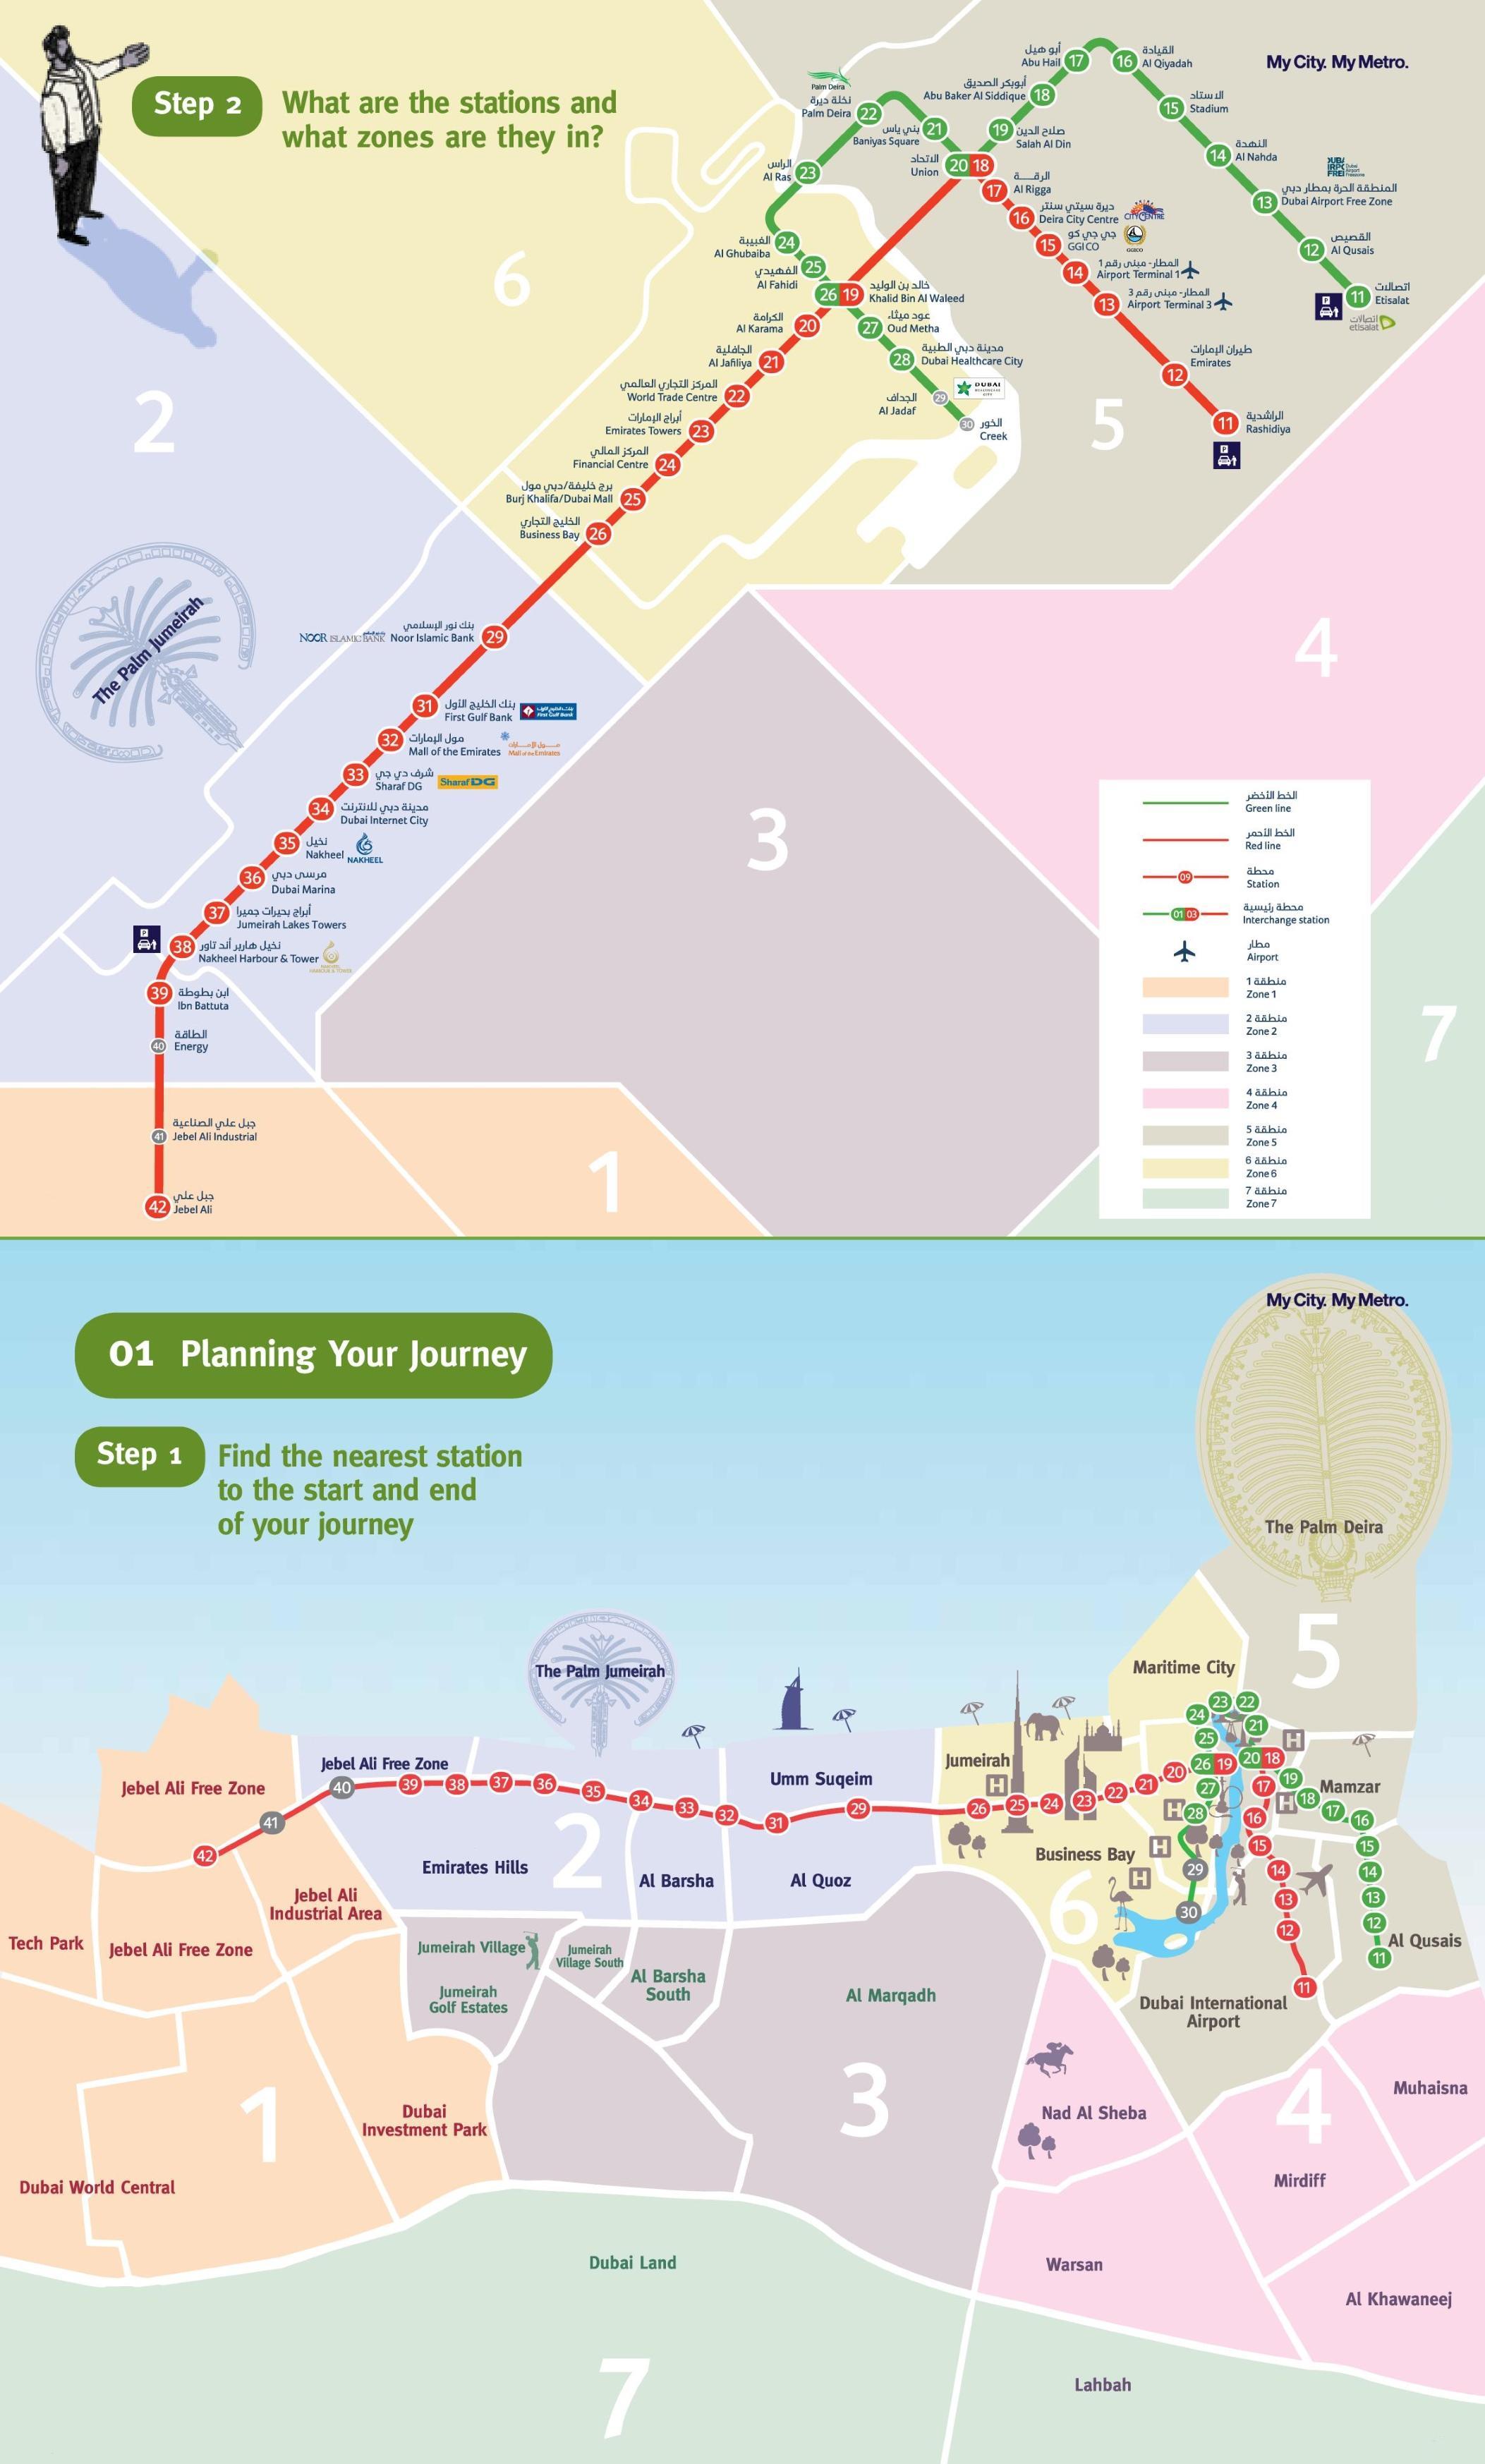 karta över dubai Dubai rör karta   Karta över Dubai röret (United Arab Emirates) karta över dubai